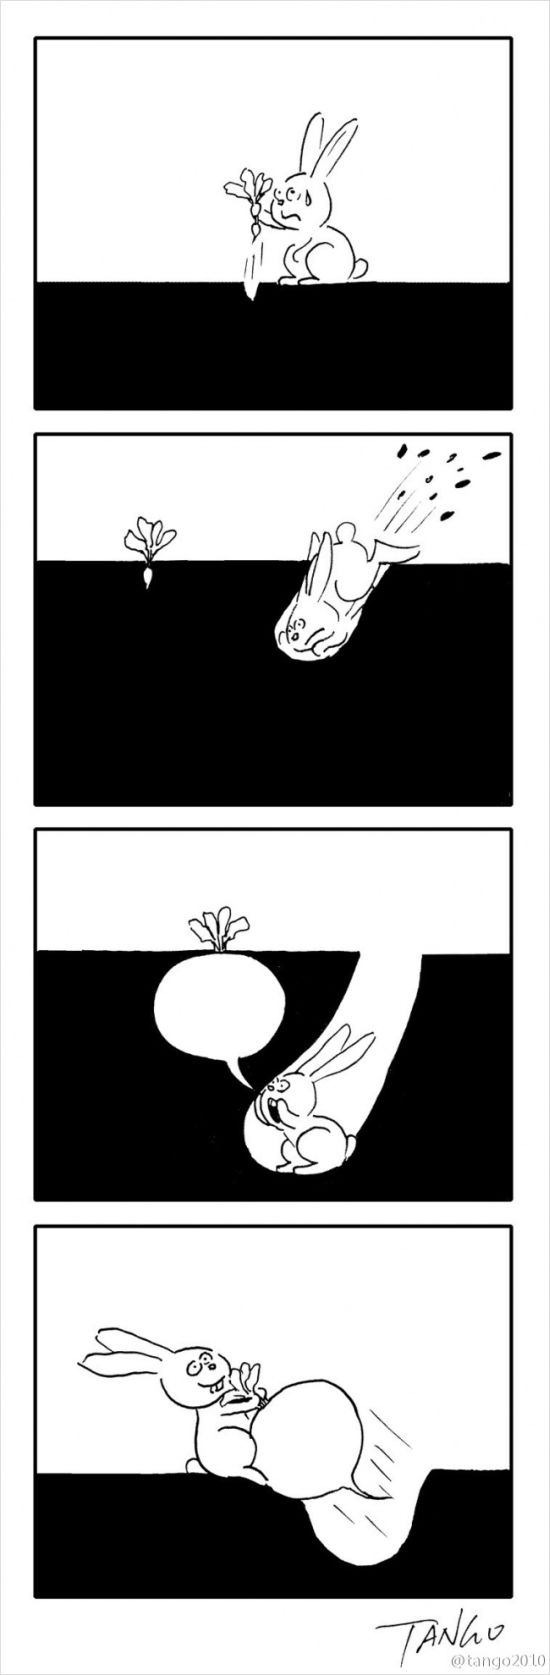 tango_cartoon_19